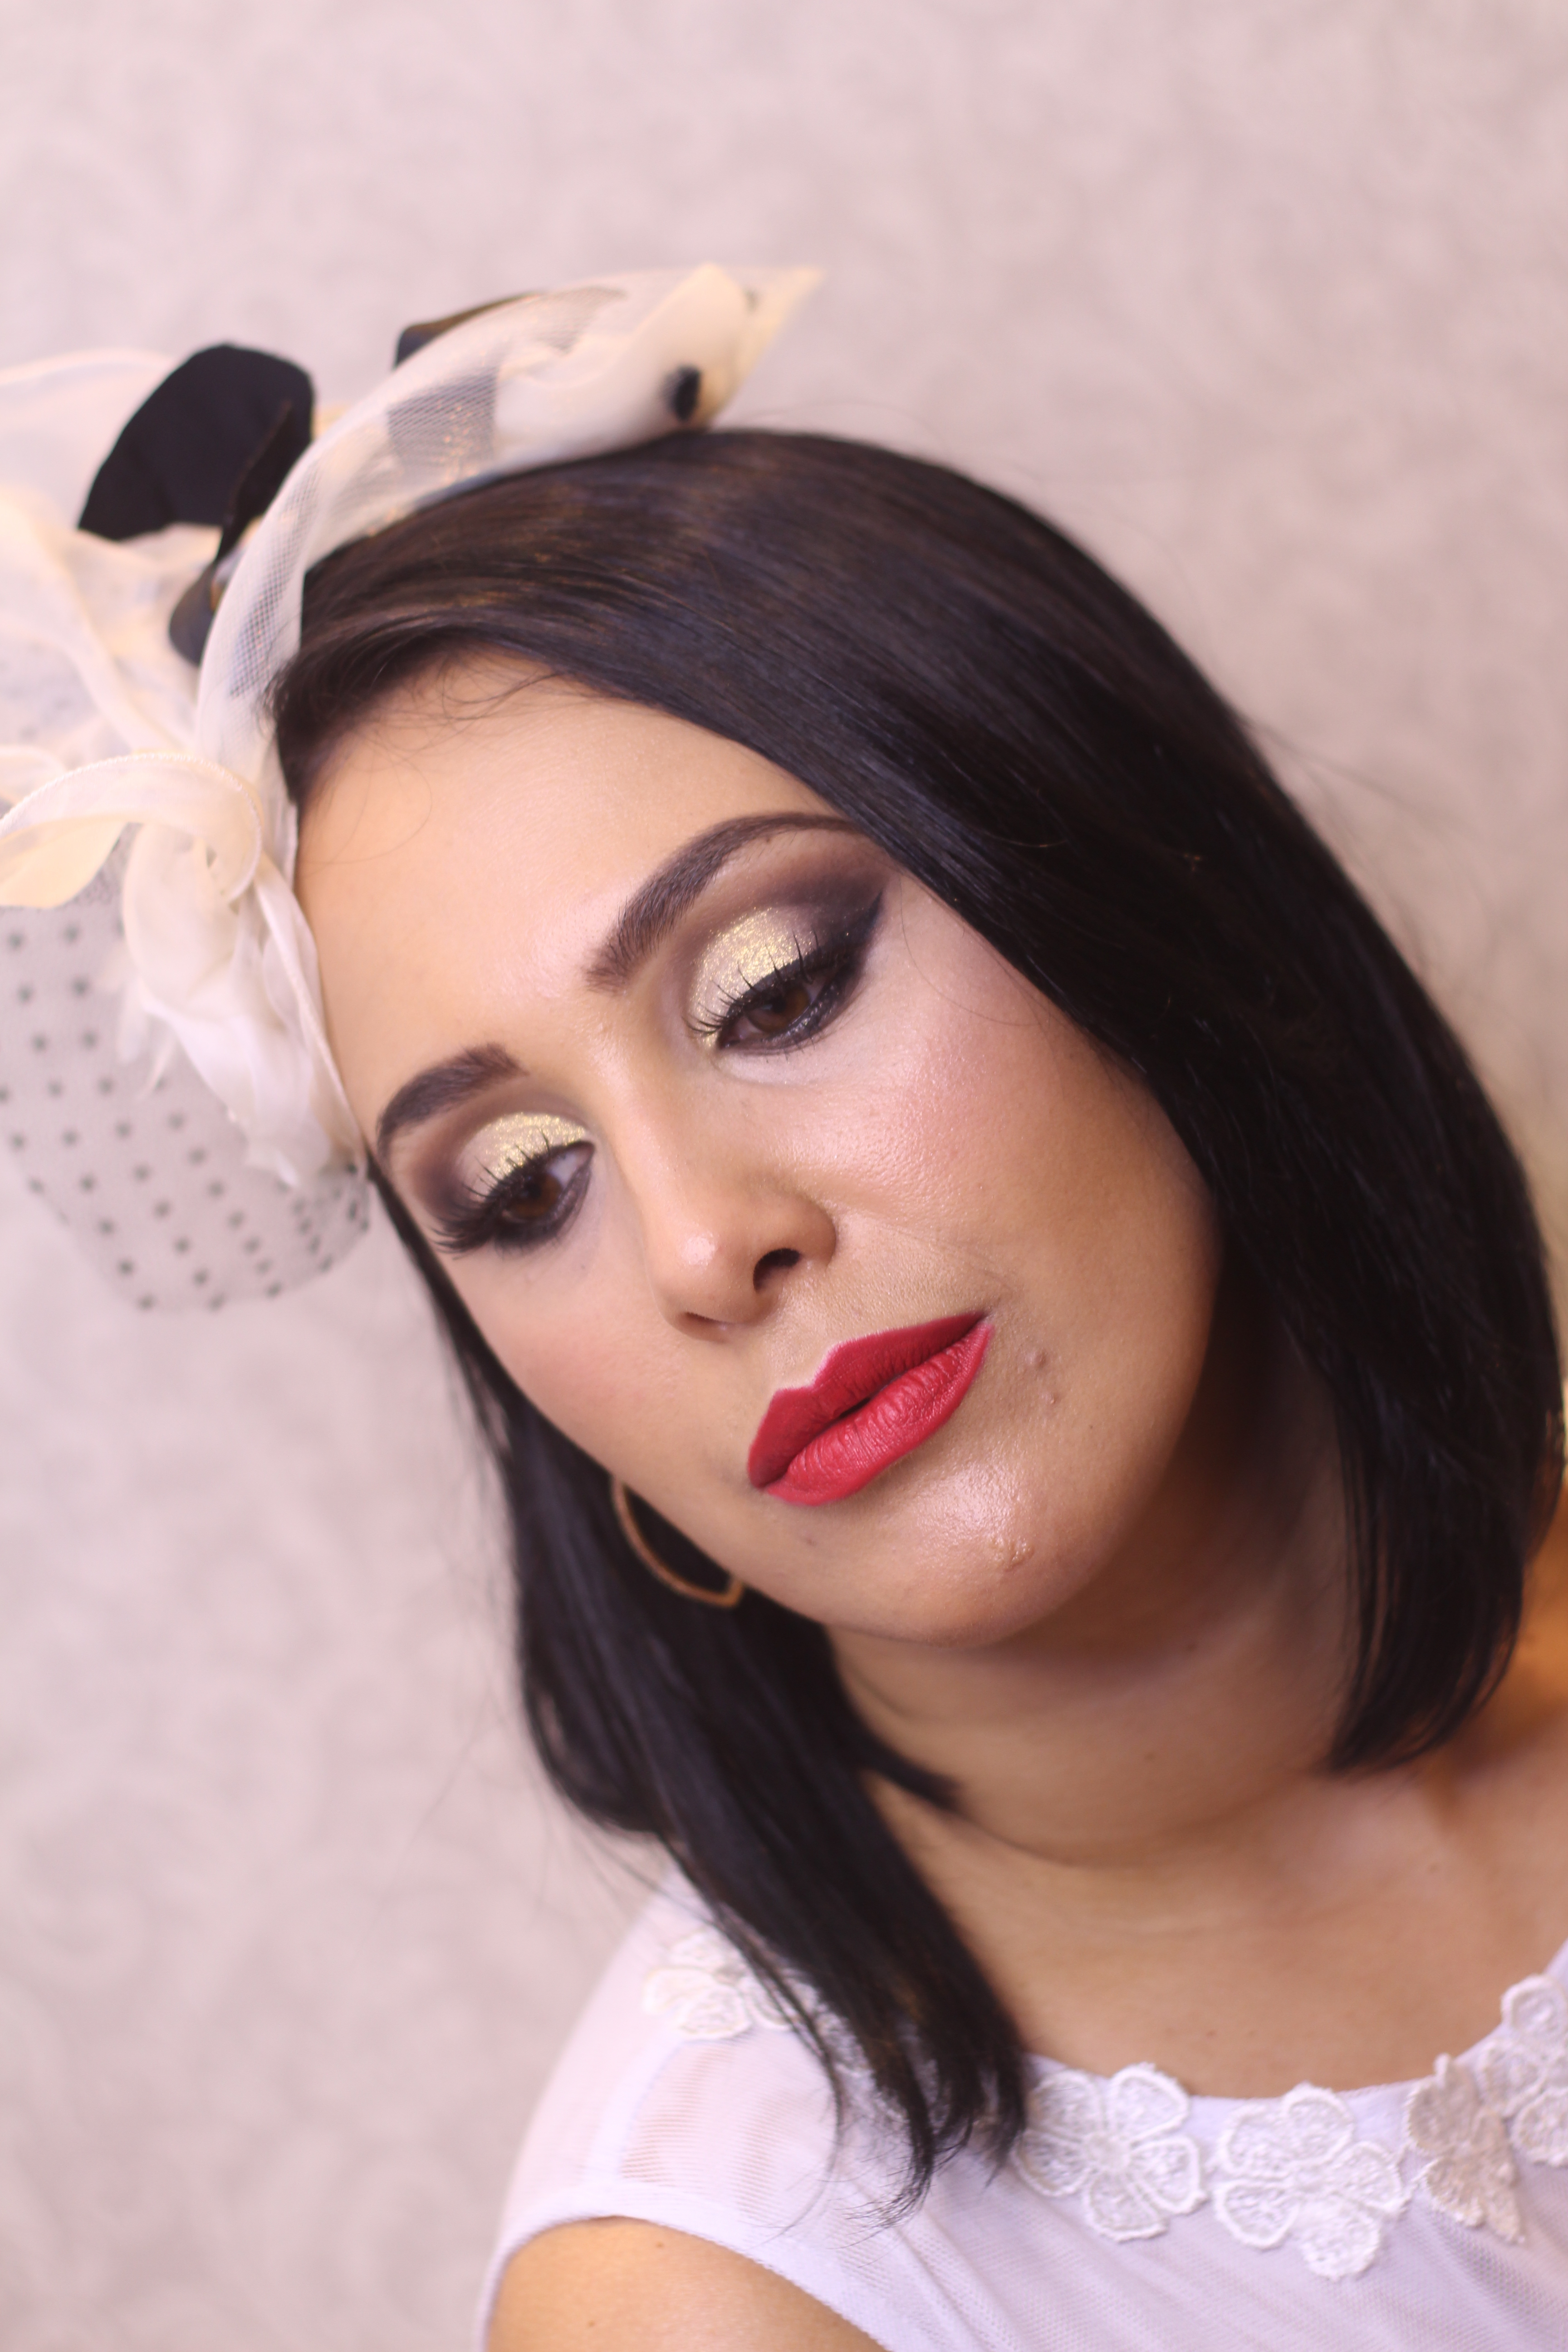 Maquiagem para editorial noiva glamourosa - Instagram @geisamedeirosmakeup #MakeUp #InstaMake #Maquiagem #MaquiagemDeFesta #MaquiagemProfissional #MaquiagemSocial #MaquiagemNoiva #GeisaMedeirosMakeUp #PPF #PausaParaFeminices #Vult #VultCosmética #Bitarra #MaryKay #RubyRose #Luisance #Dailus #QuemDisseBerenice #Contém1g #Morphe #PincéisMacrilan #LuFerraes #Mac maquiagem maquiador(a) designer de sobrancelhas